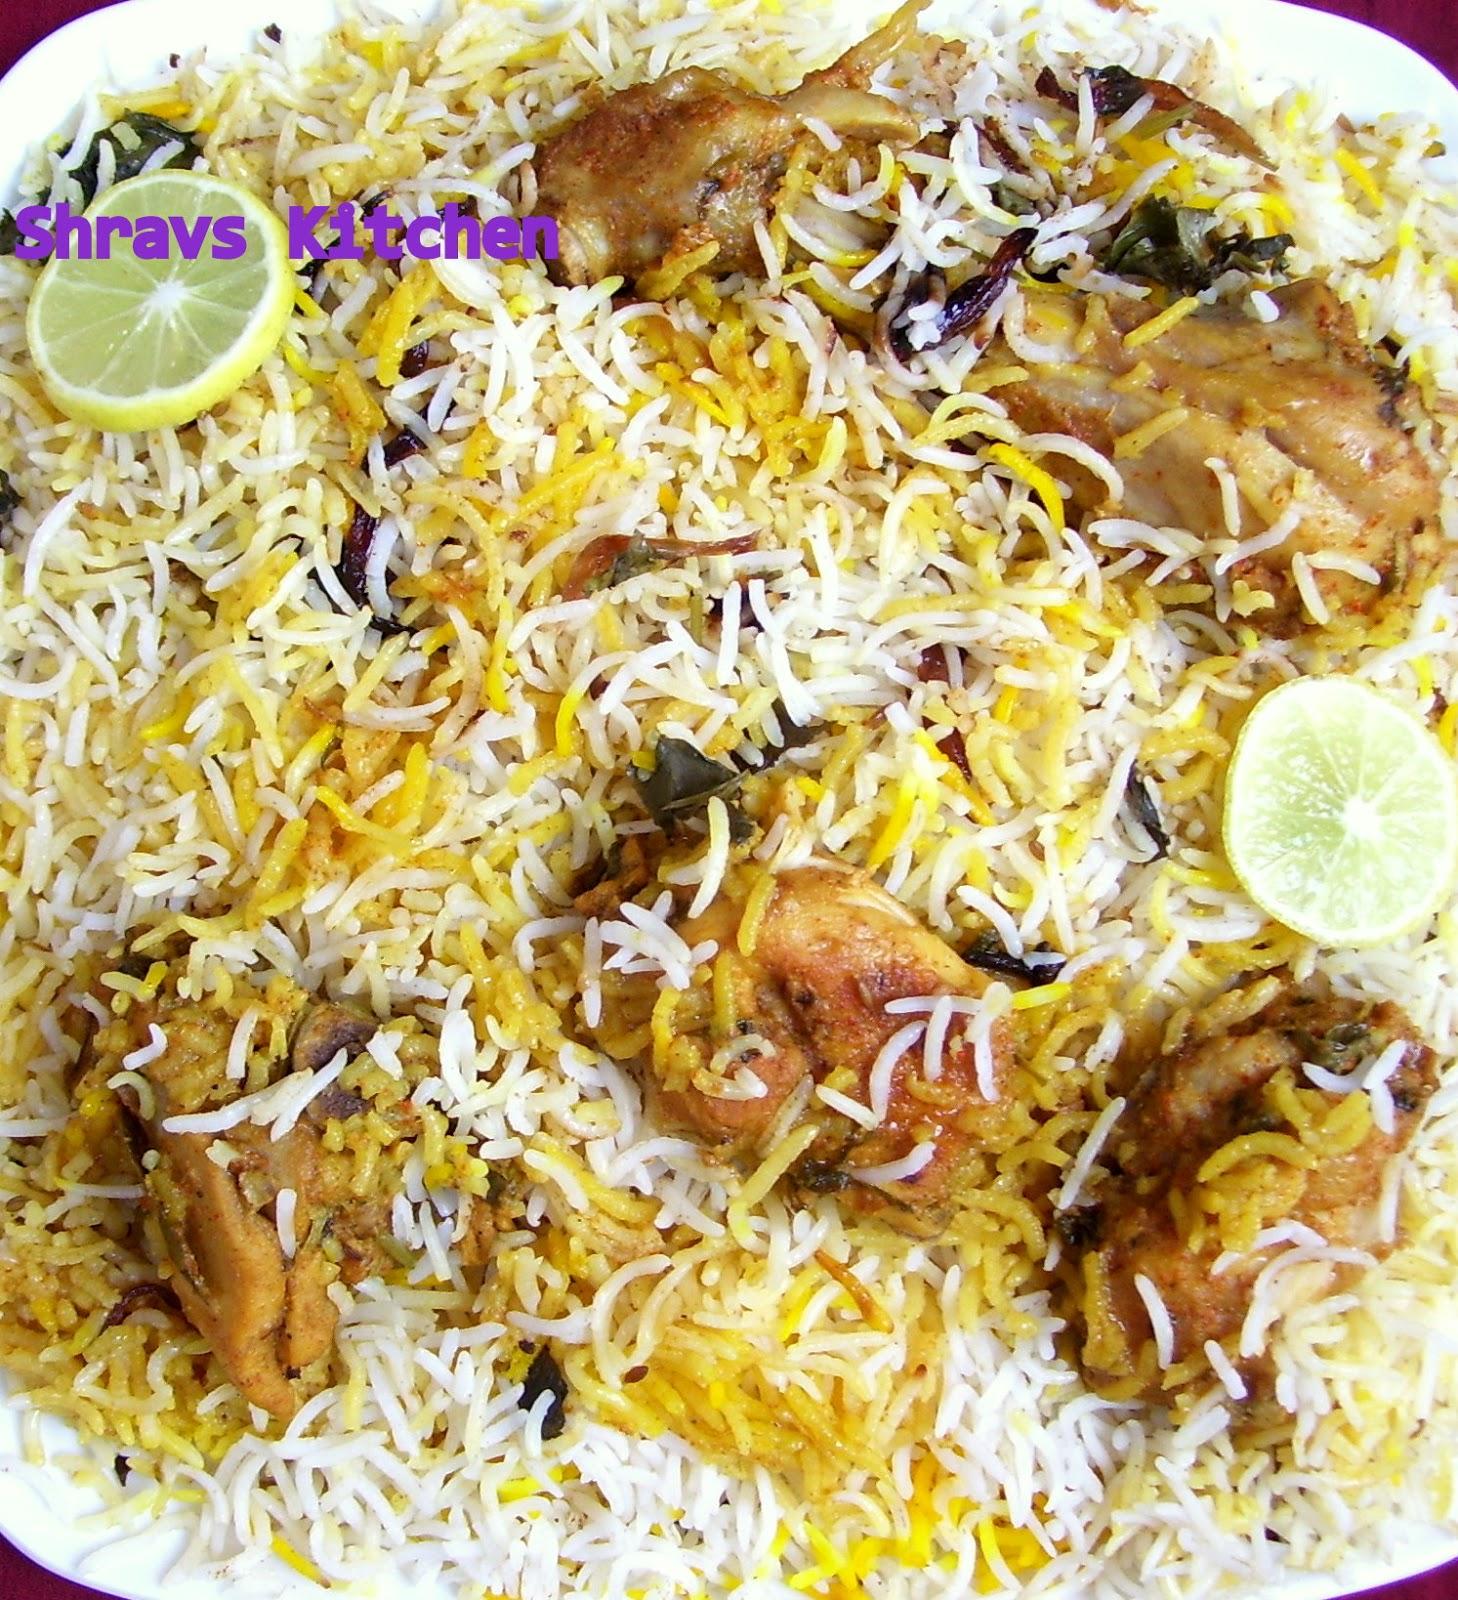 Shravs Kitch... Hyderabadi Chicken Biryani